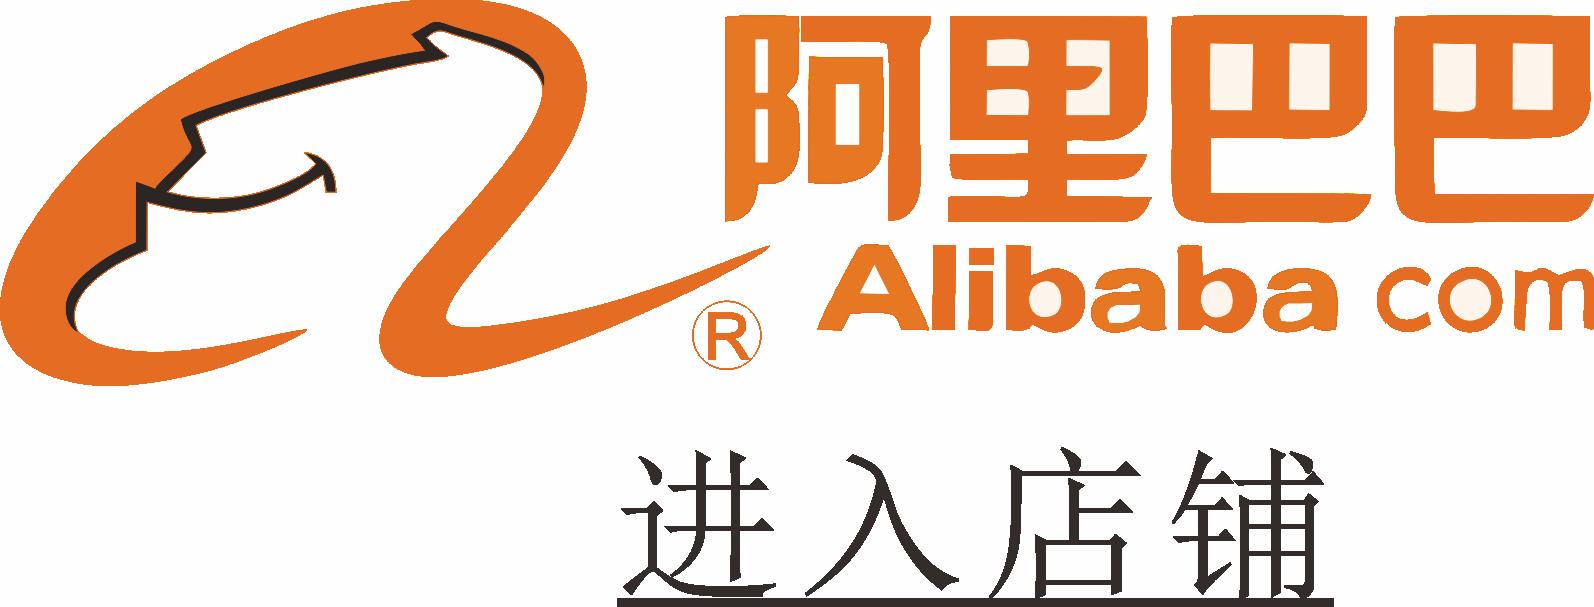 65cm湘鋼散雜貨船模型_散貨船模型_海藝坊船舶模型制作